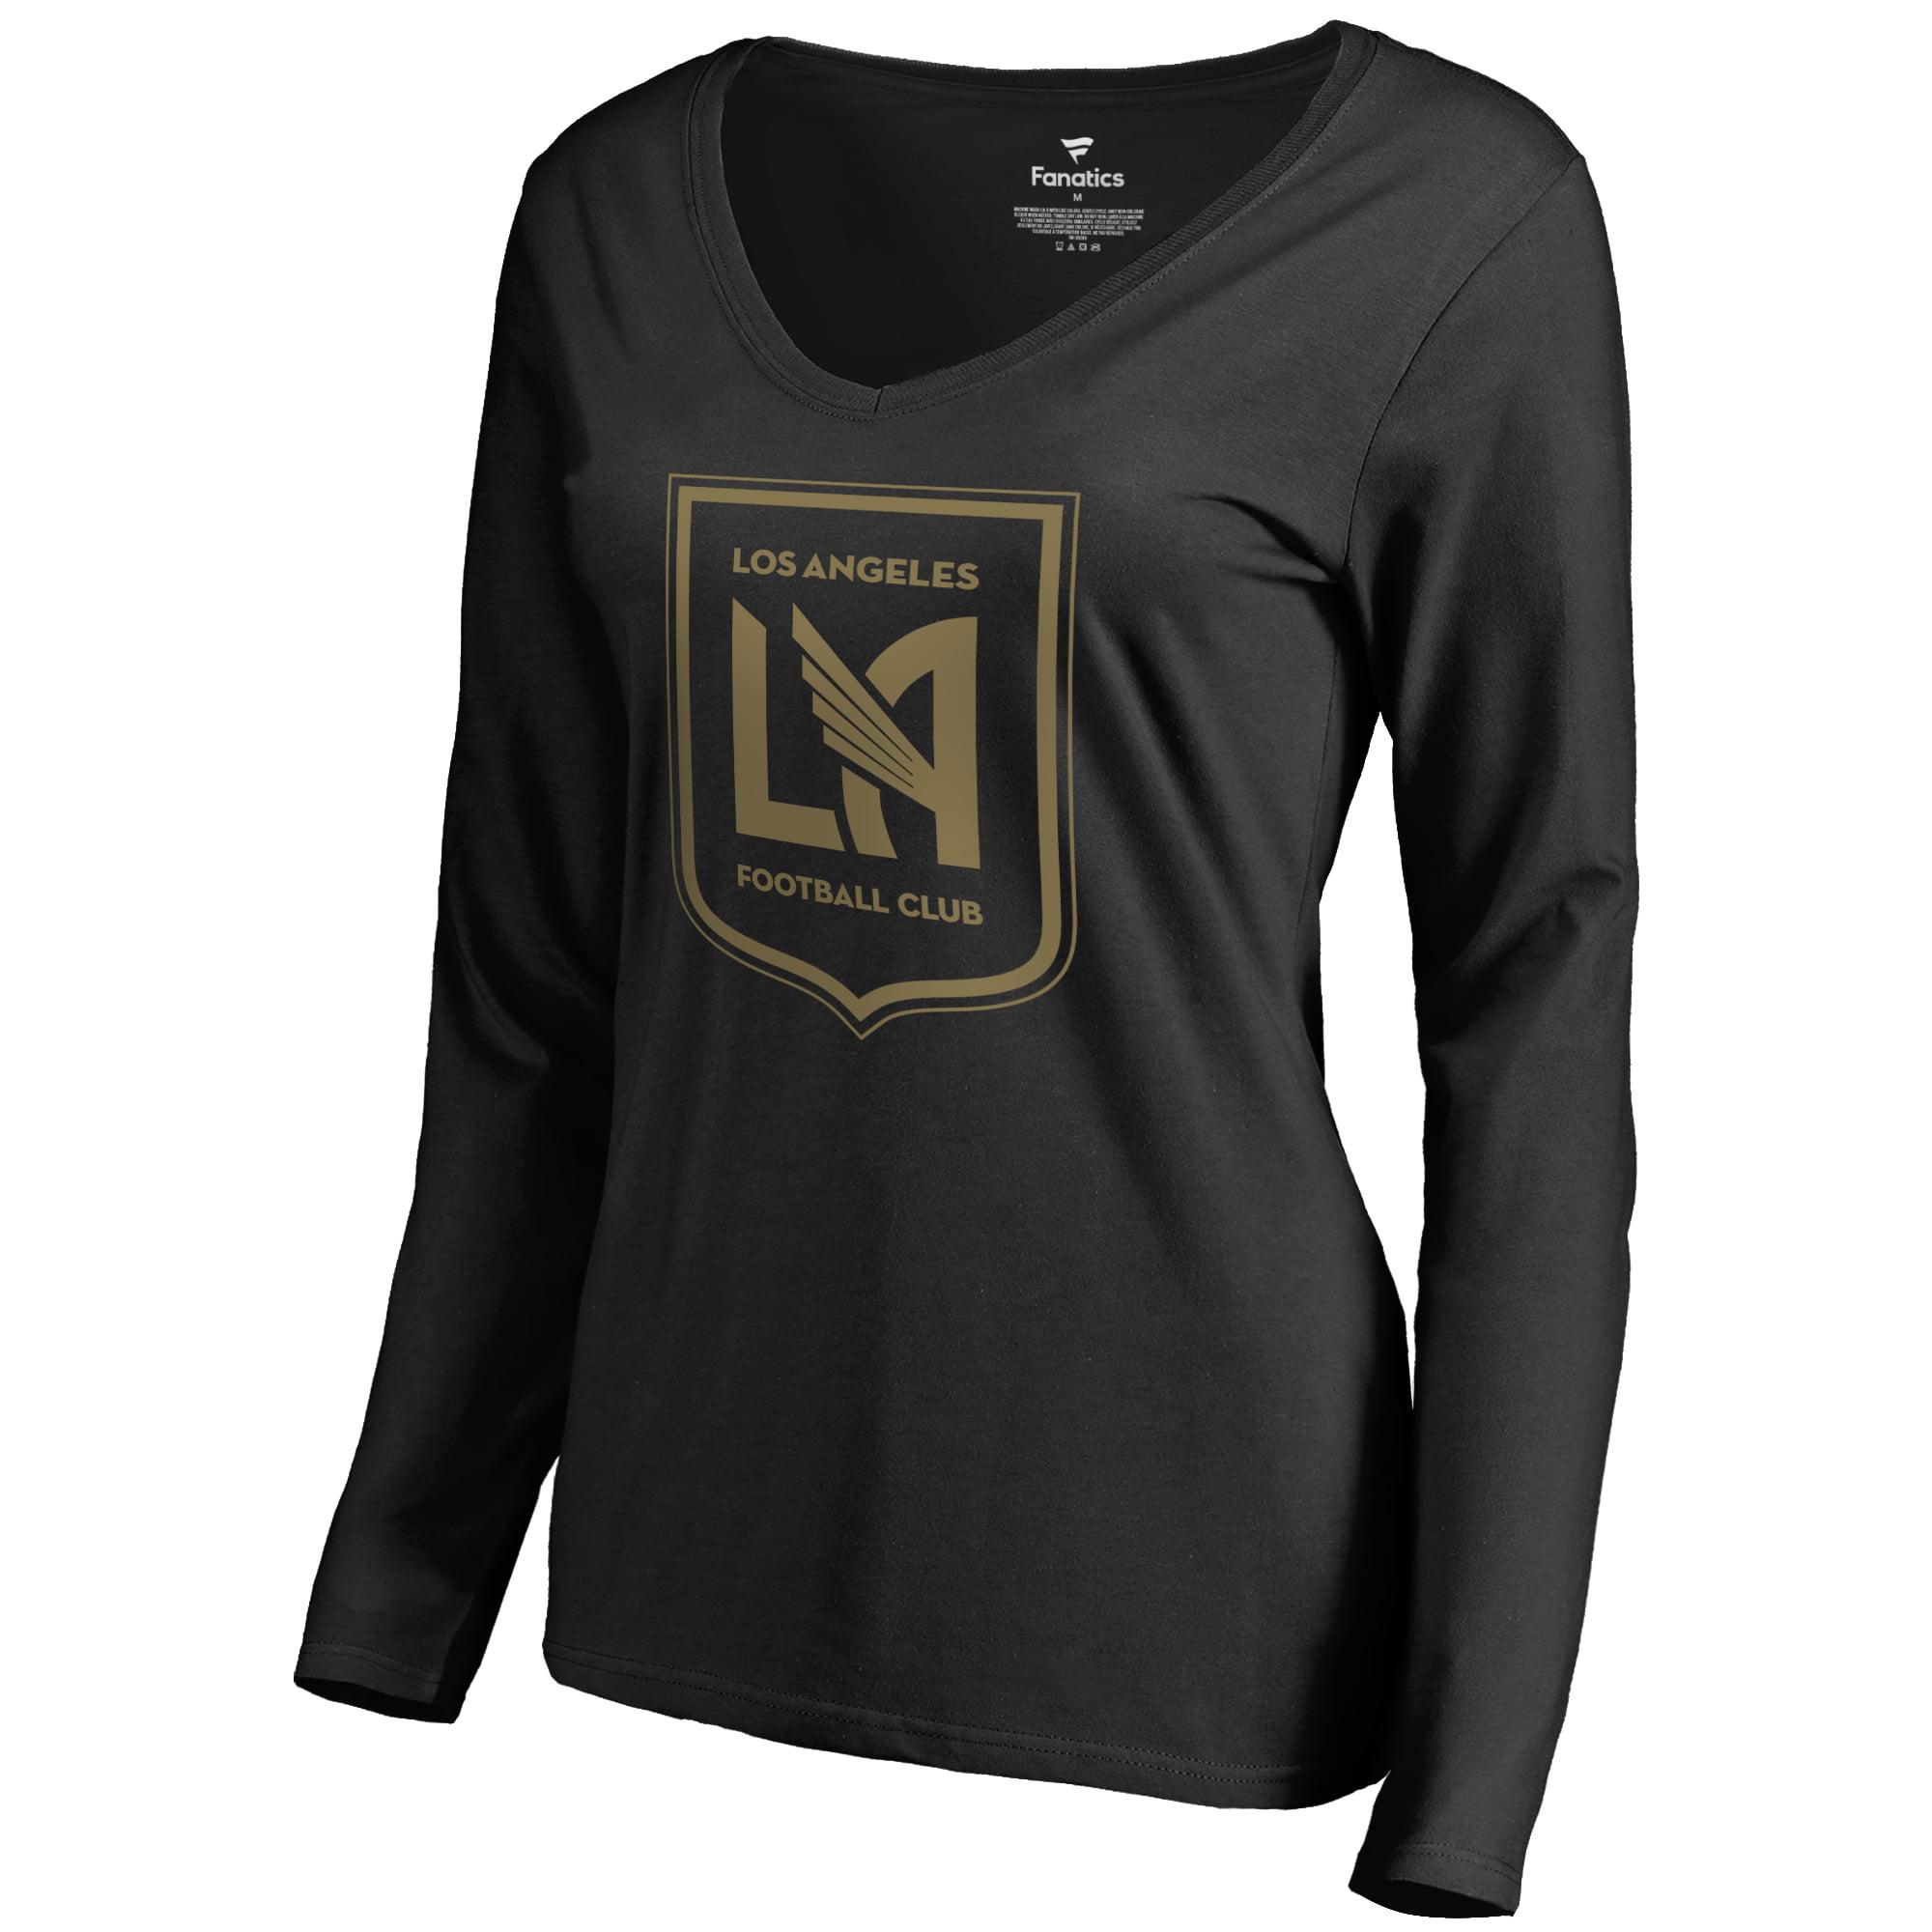 4b837d3dc Carlos Vela LAFC Fanatics Branded Women s Backer Name   Number Long Sleeve  V-Neck T-Shirt - Black - Walmart.com